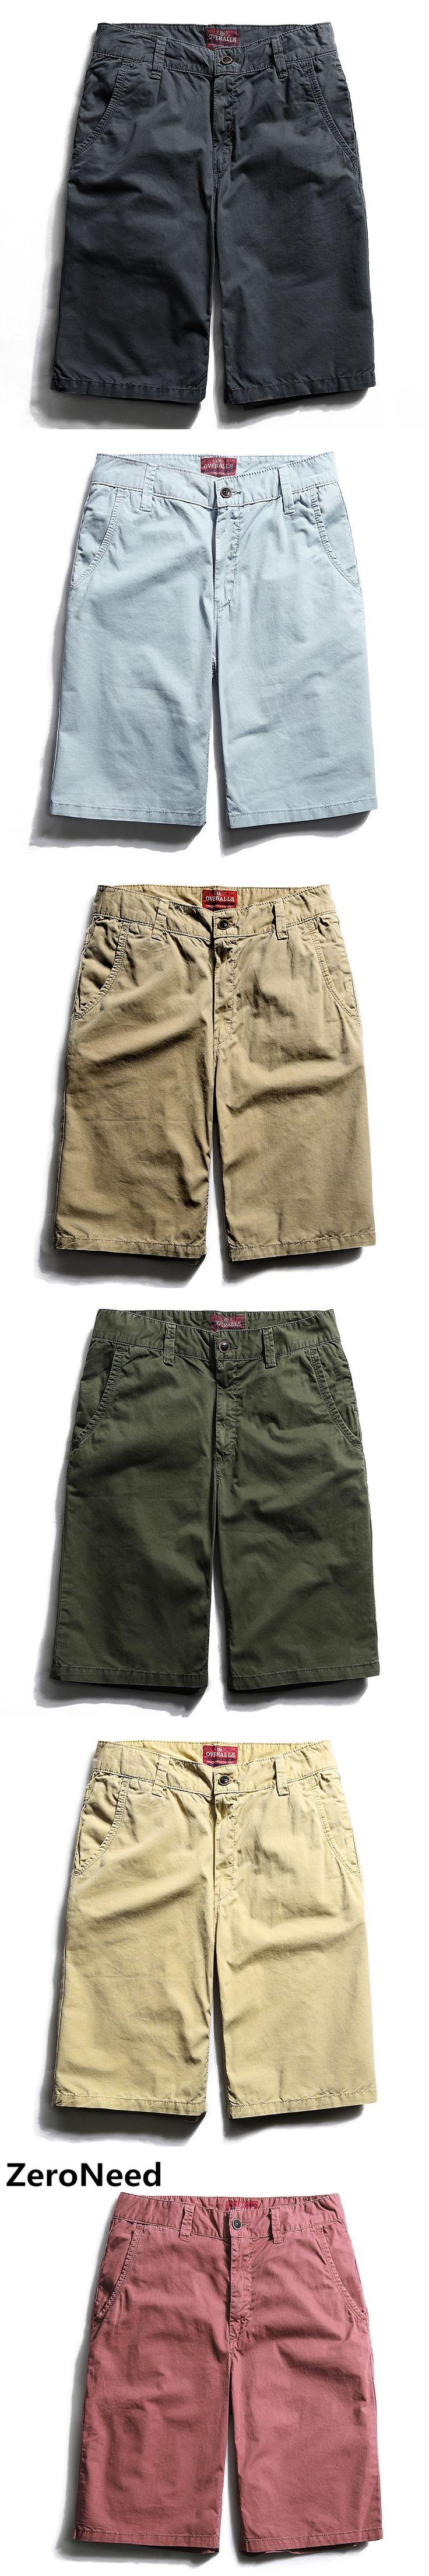 2017 Hot Summer Casual Cargo Shorts Bermuda Shorts Brand Men Khaki Trousers Workout Wear Bottoms Homme Joggers mma Short 202